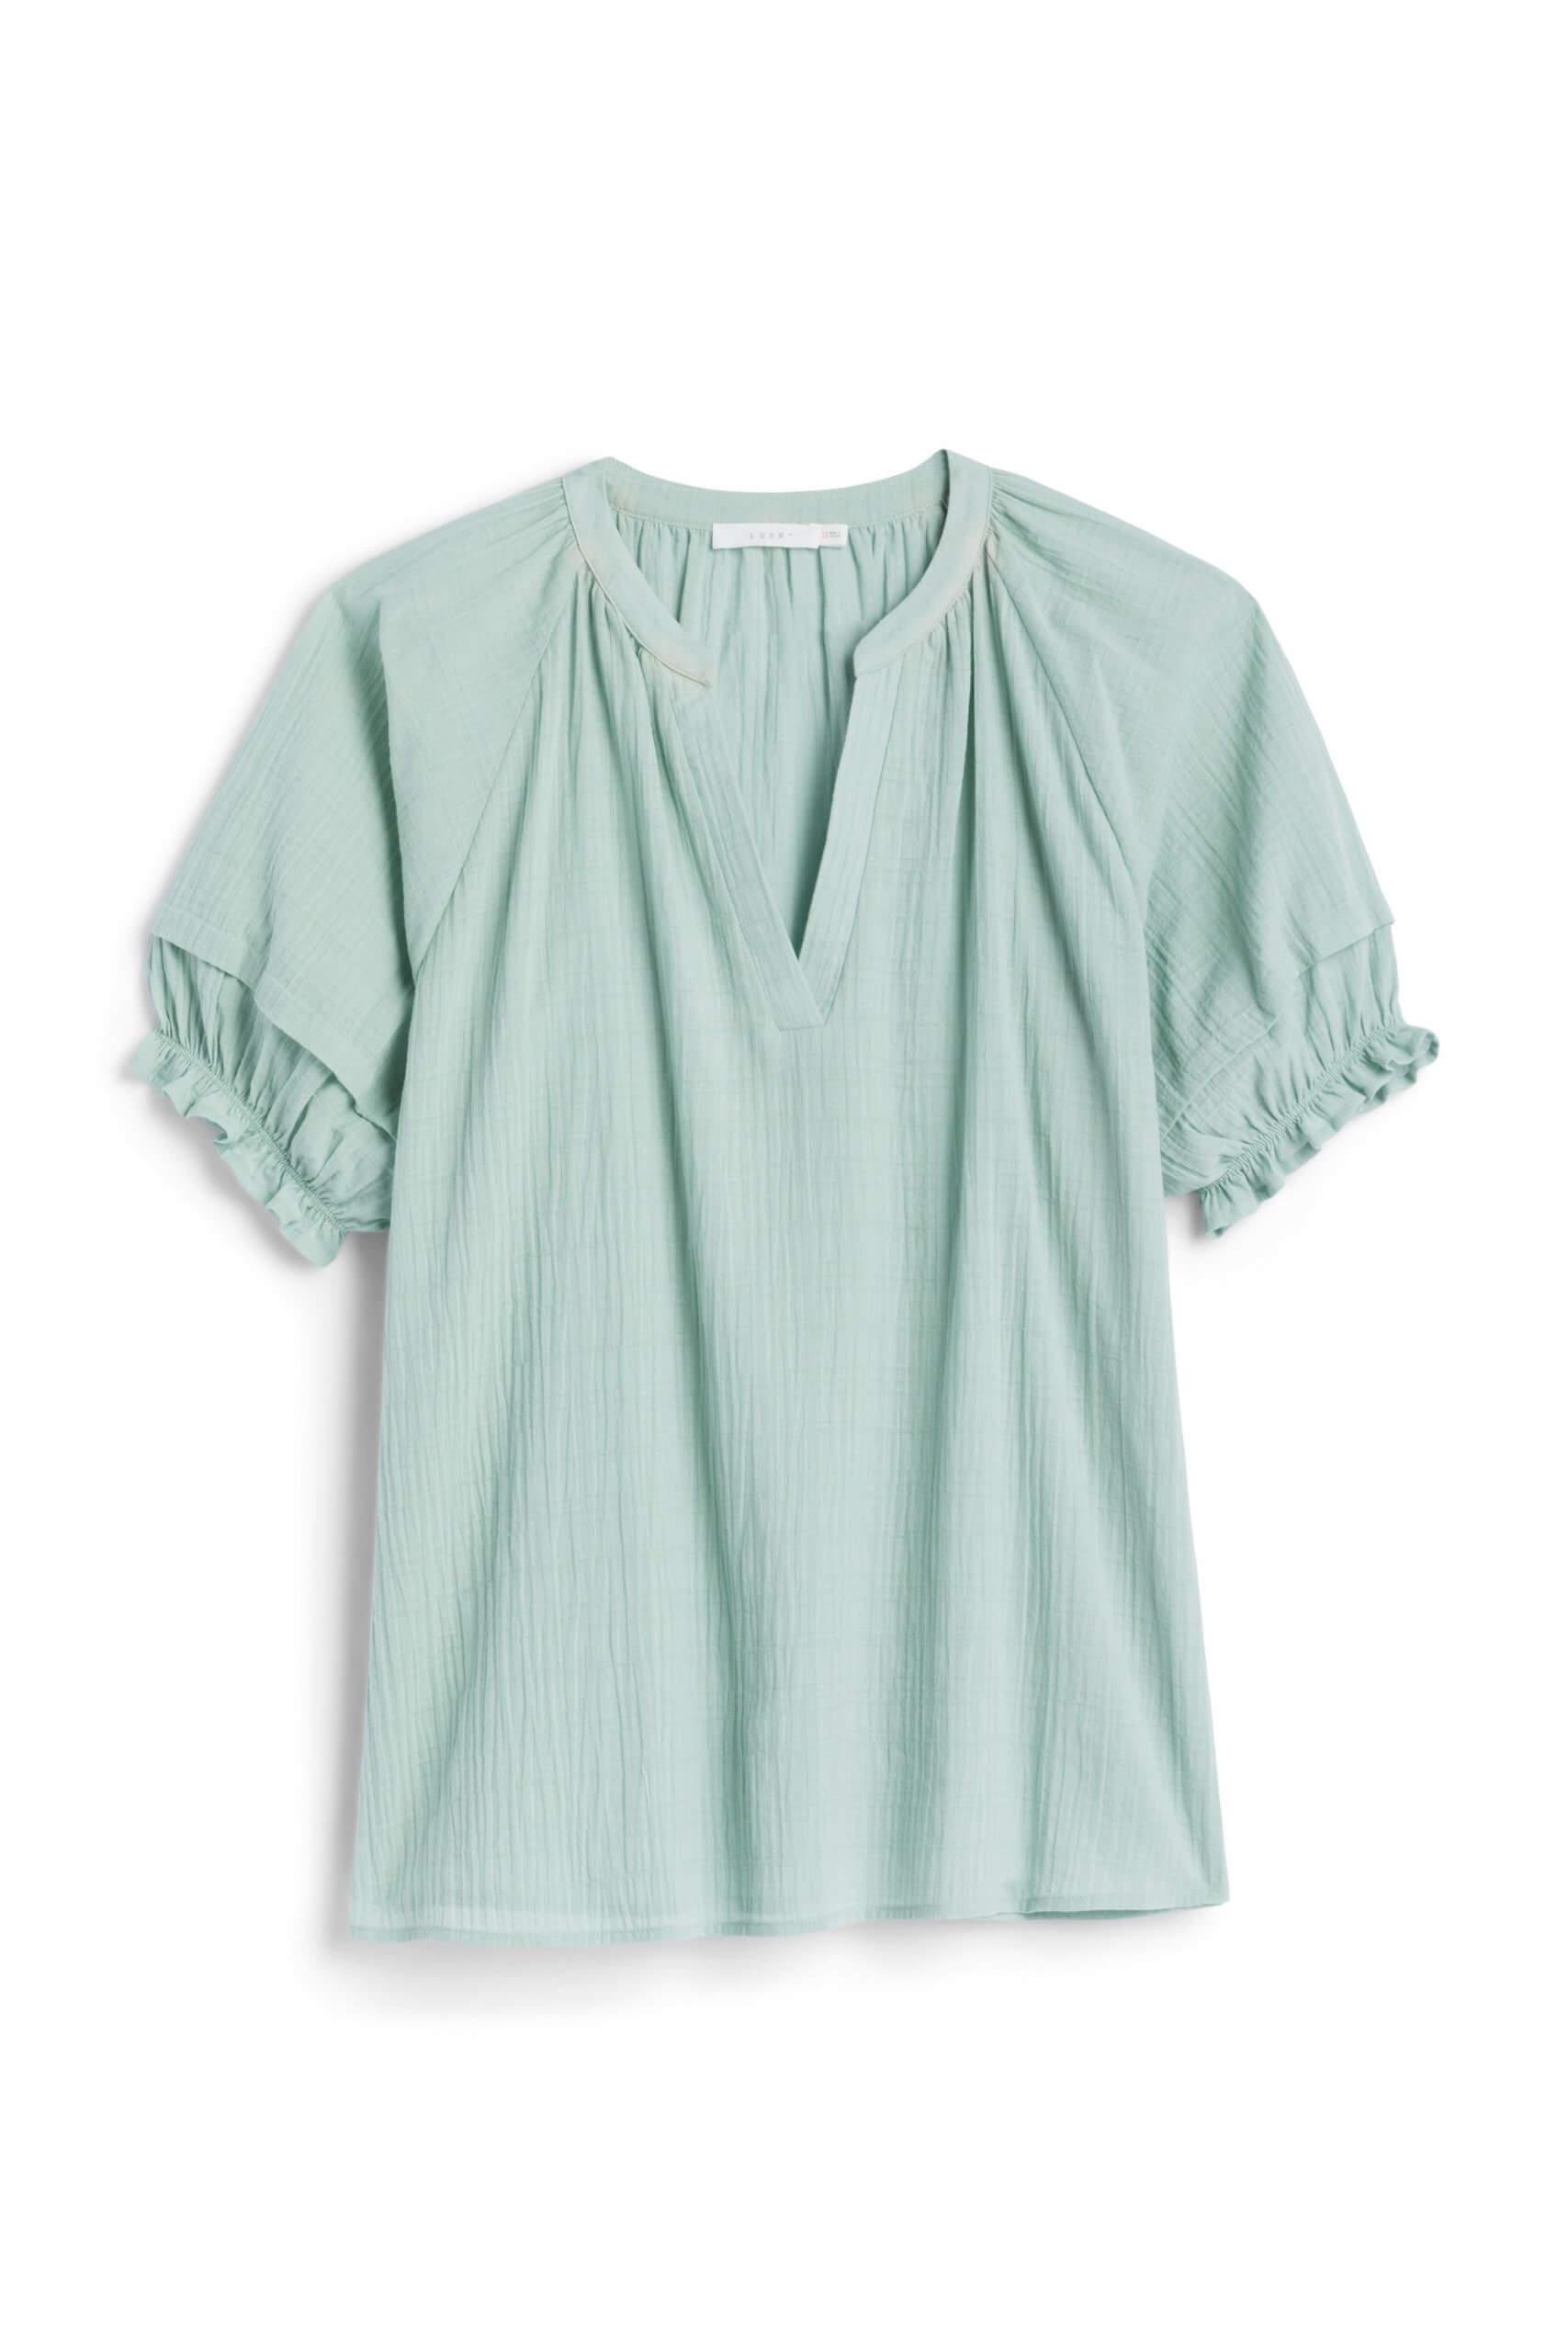 Stitch Fix Women's mint green ruffle sleeve shirt.